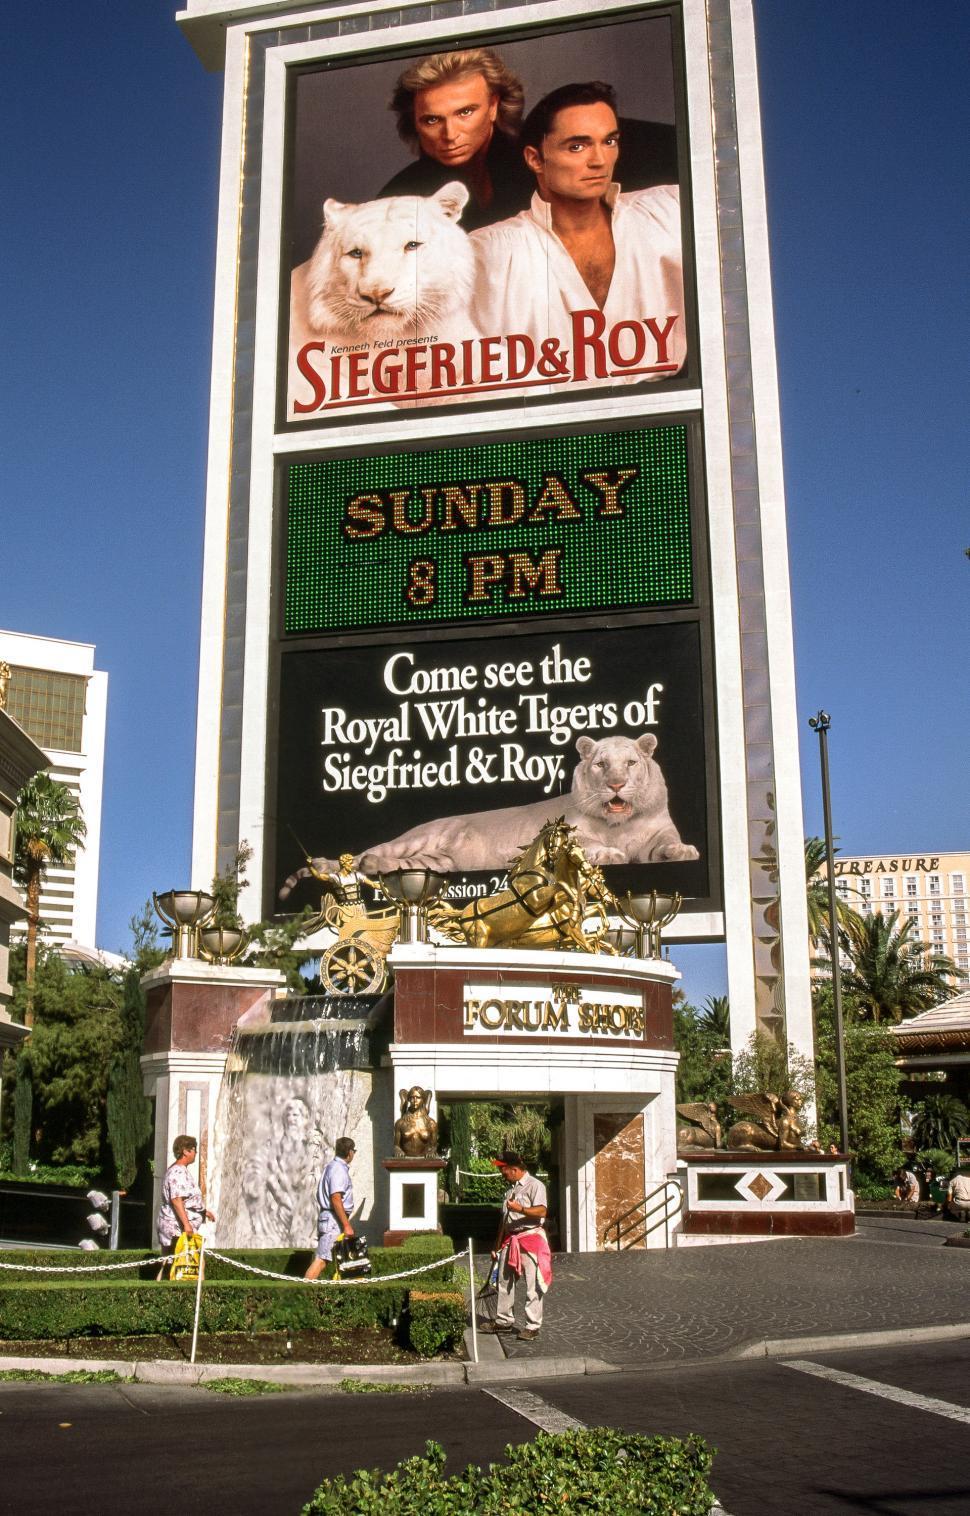 Download Free Stock Photo of Vintage Siegfried Roy on Billboard